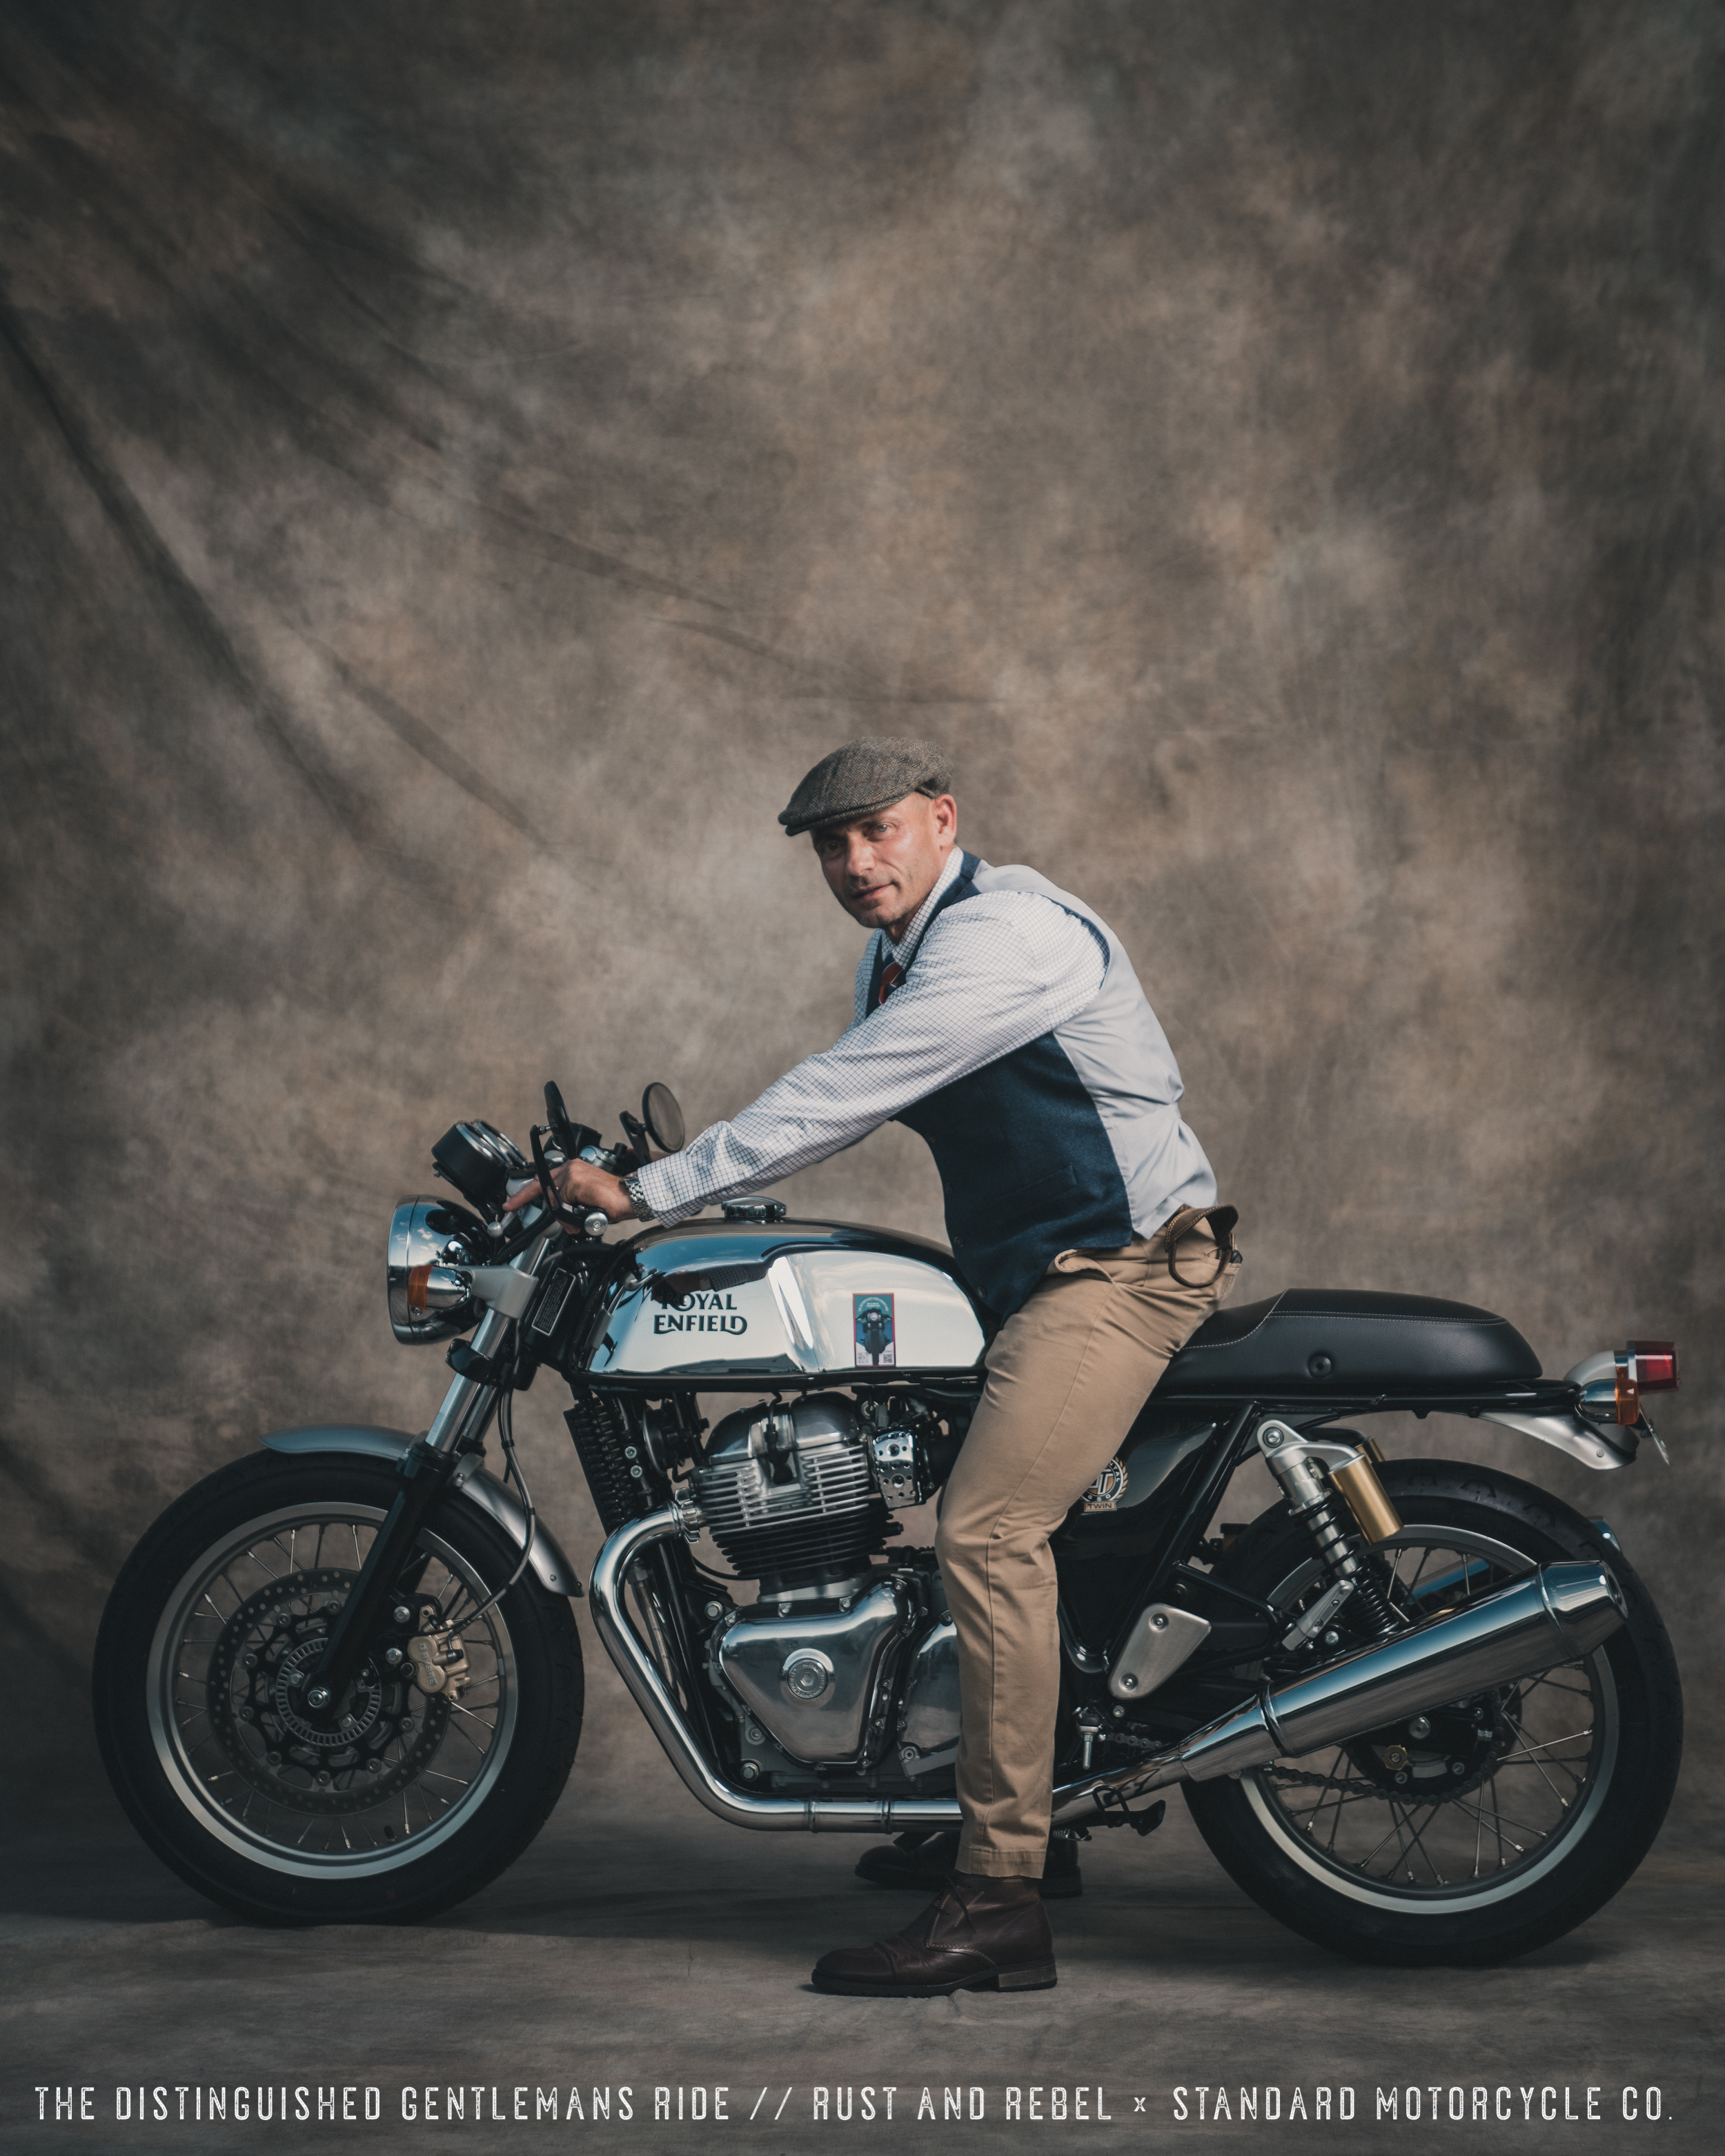 The Distinguished Gentleman's Ride 2019 [PEOPLE - PHOTO BY @MIKEDUNNUSA] - 0112.jpg